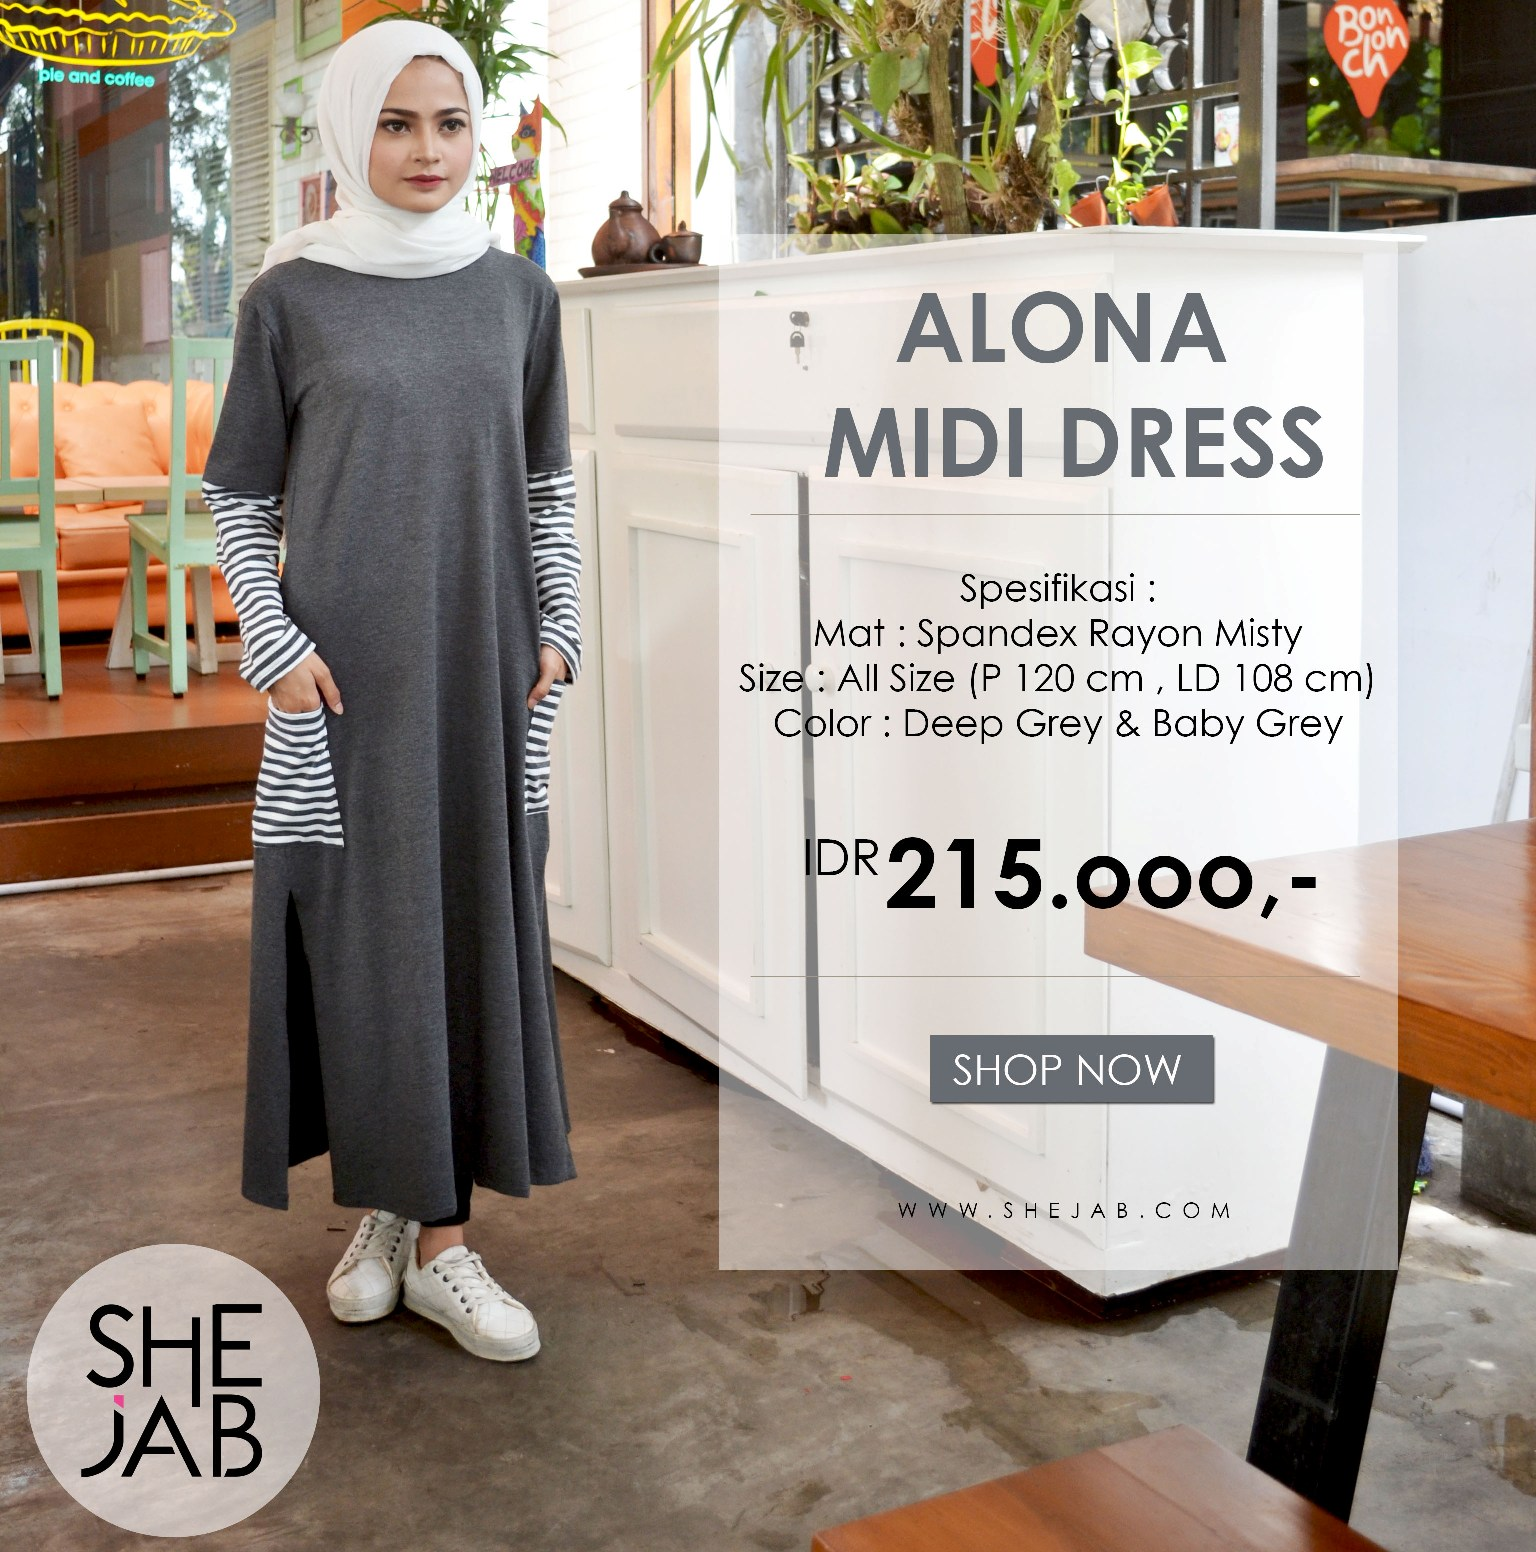 Jual Gamis Santai Lembut Nyaman Baju Muslim Wanita Shejab Alona